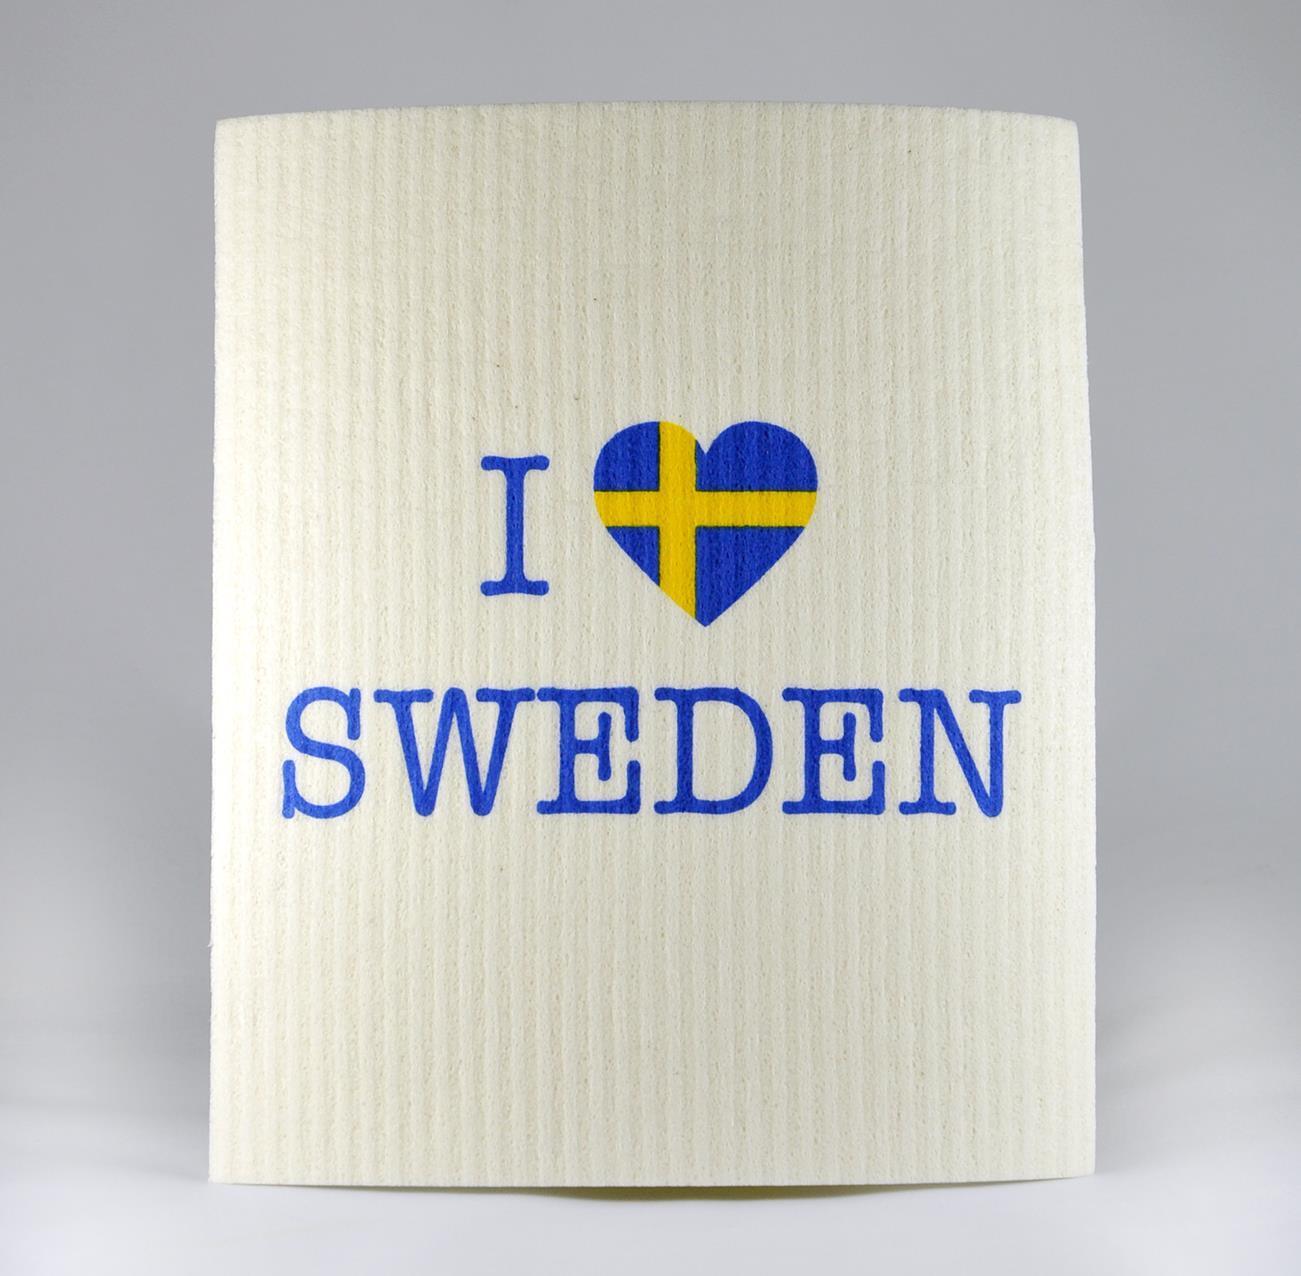 Disktrasa, I love Sweden, vit blå/gul text